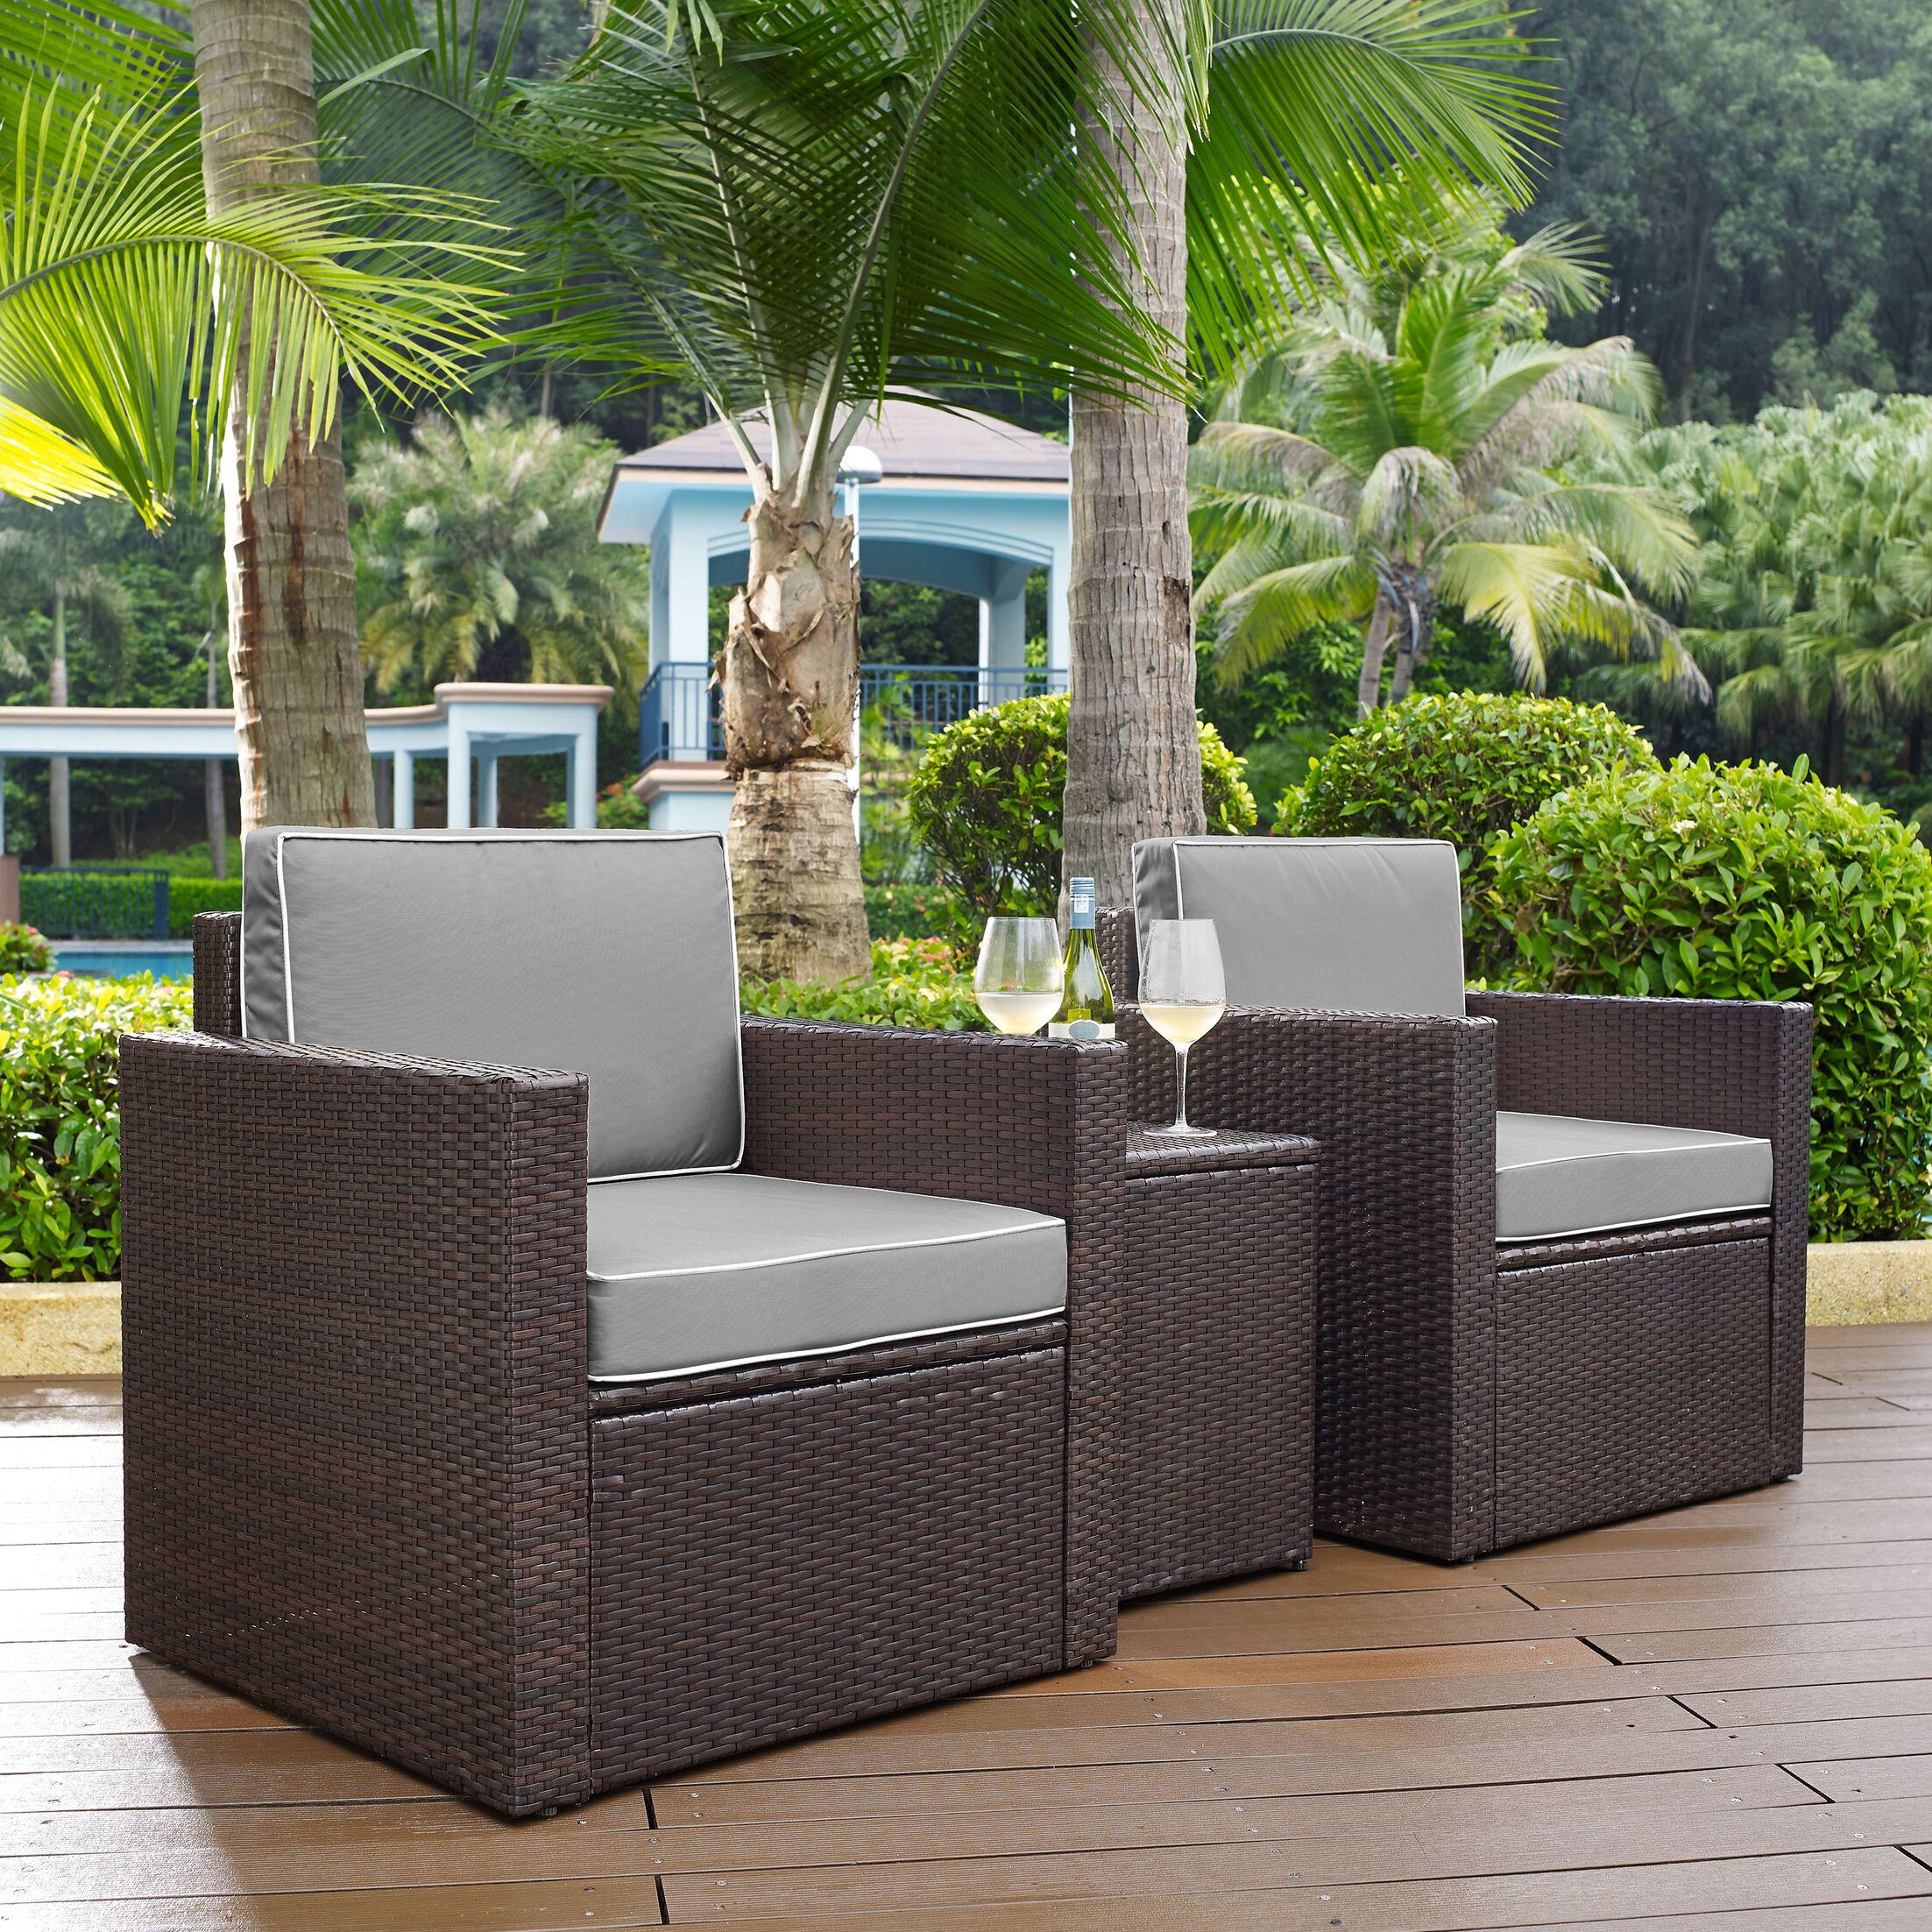 Belton 3 Piece Conversation Set with Cushions Fabric: Grey